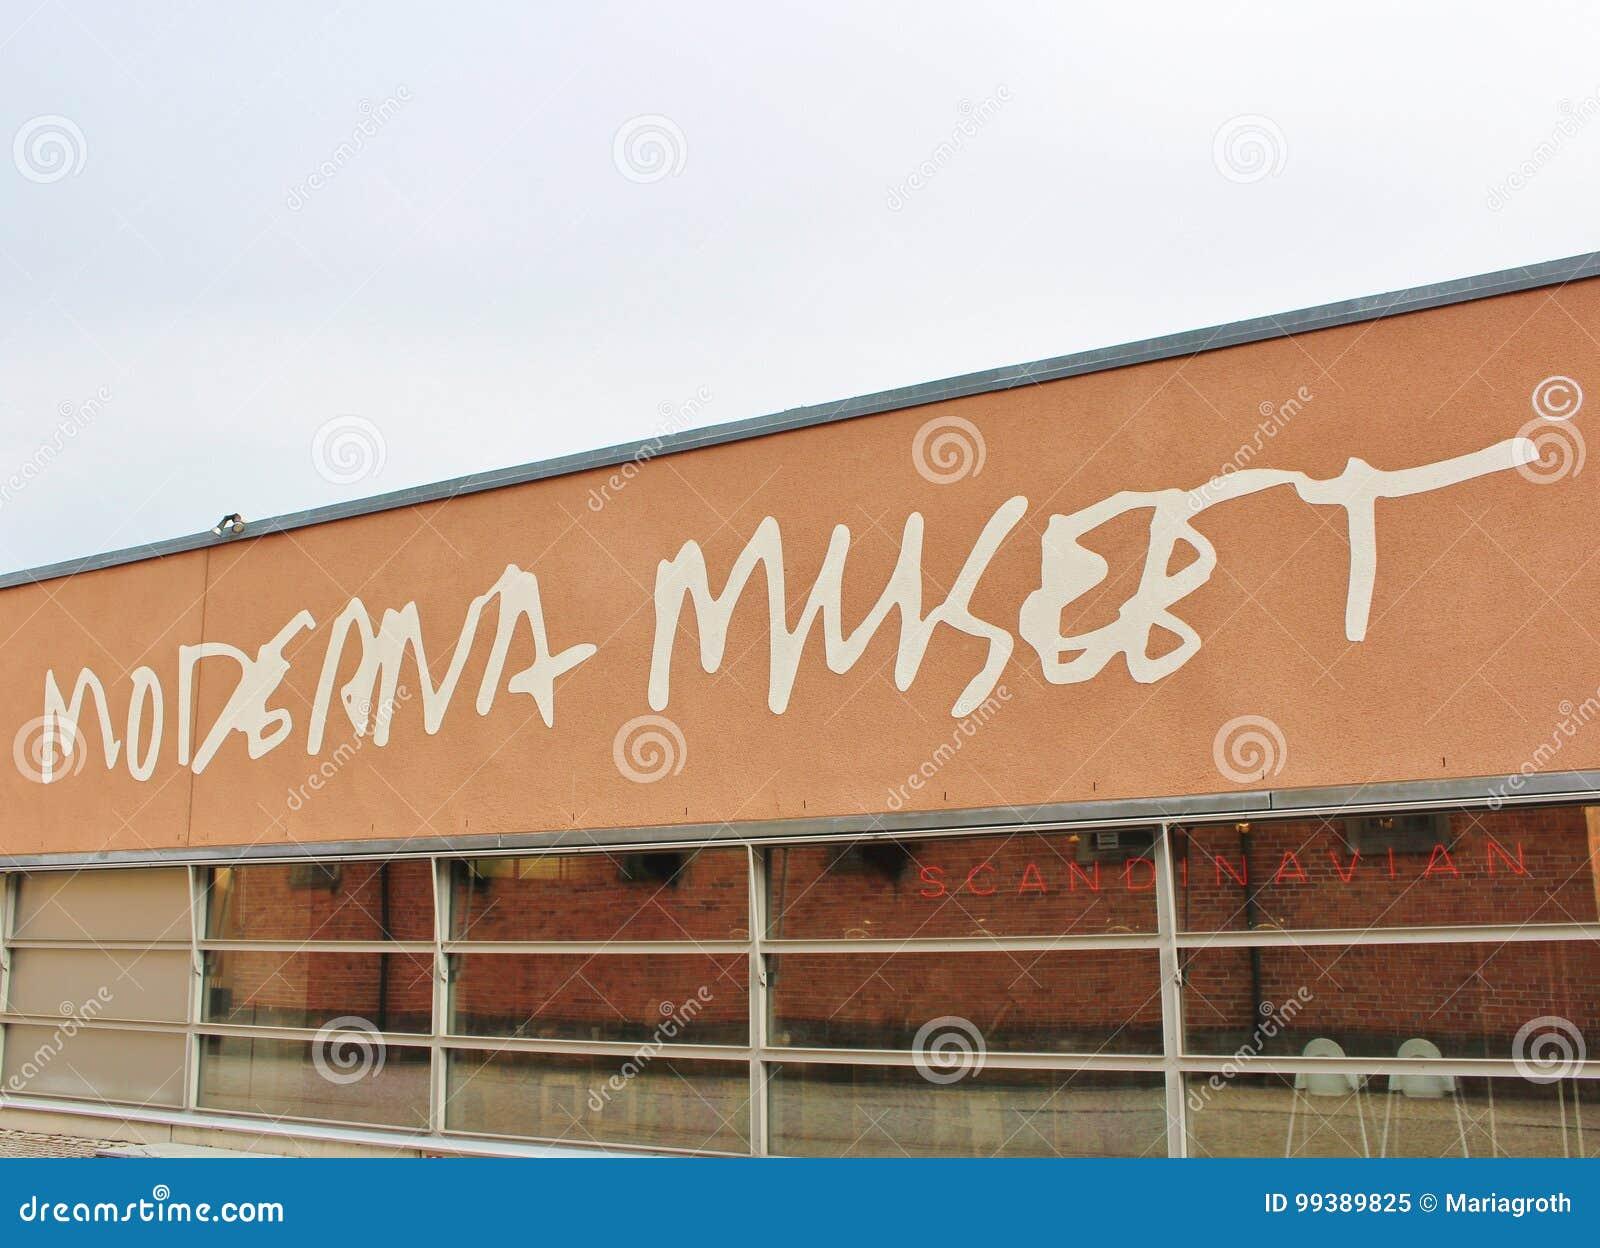 Moderna museet, Stockholm editorial image. Image of artist ...